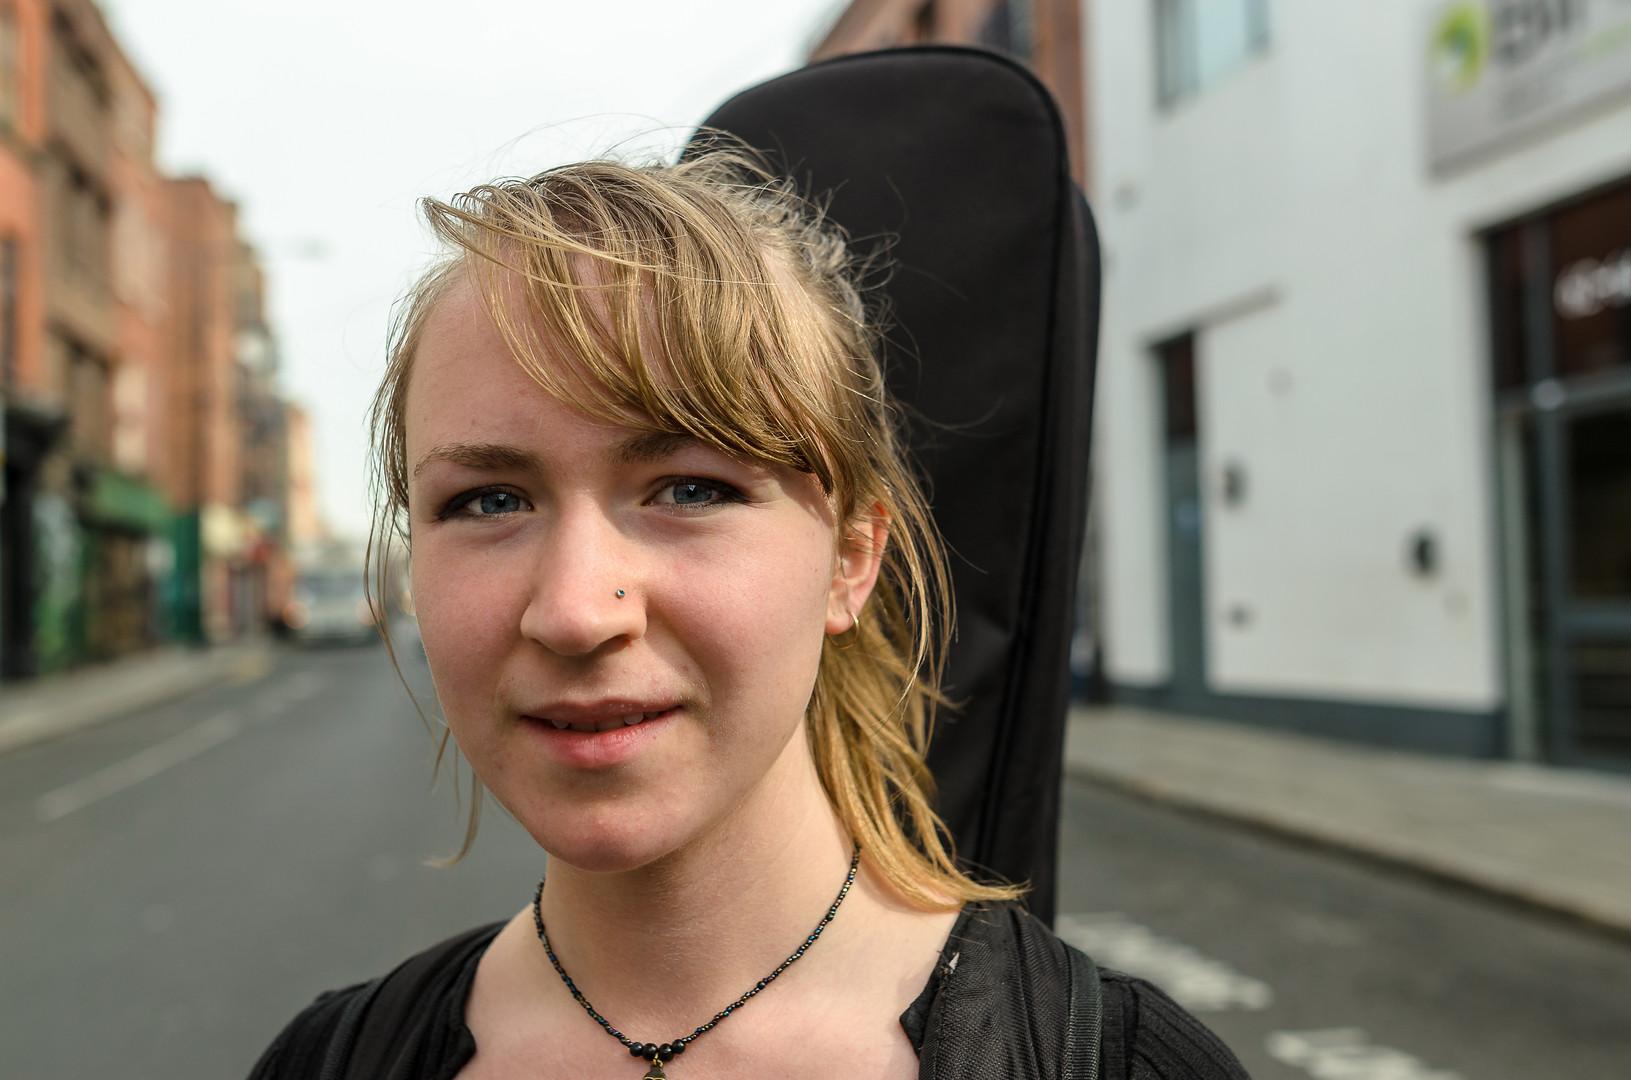 Leila Jane Musician – BIMM, Francis street